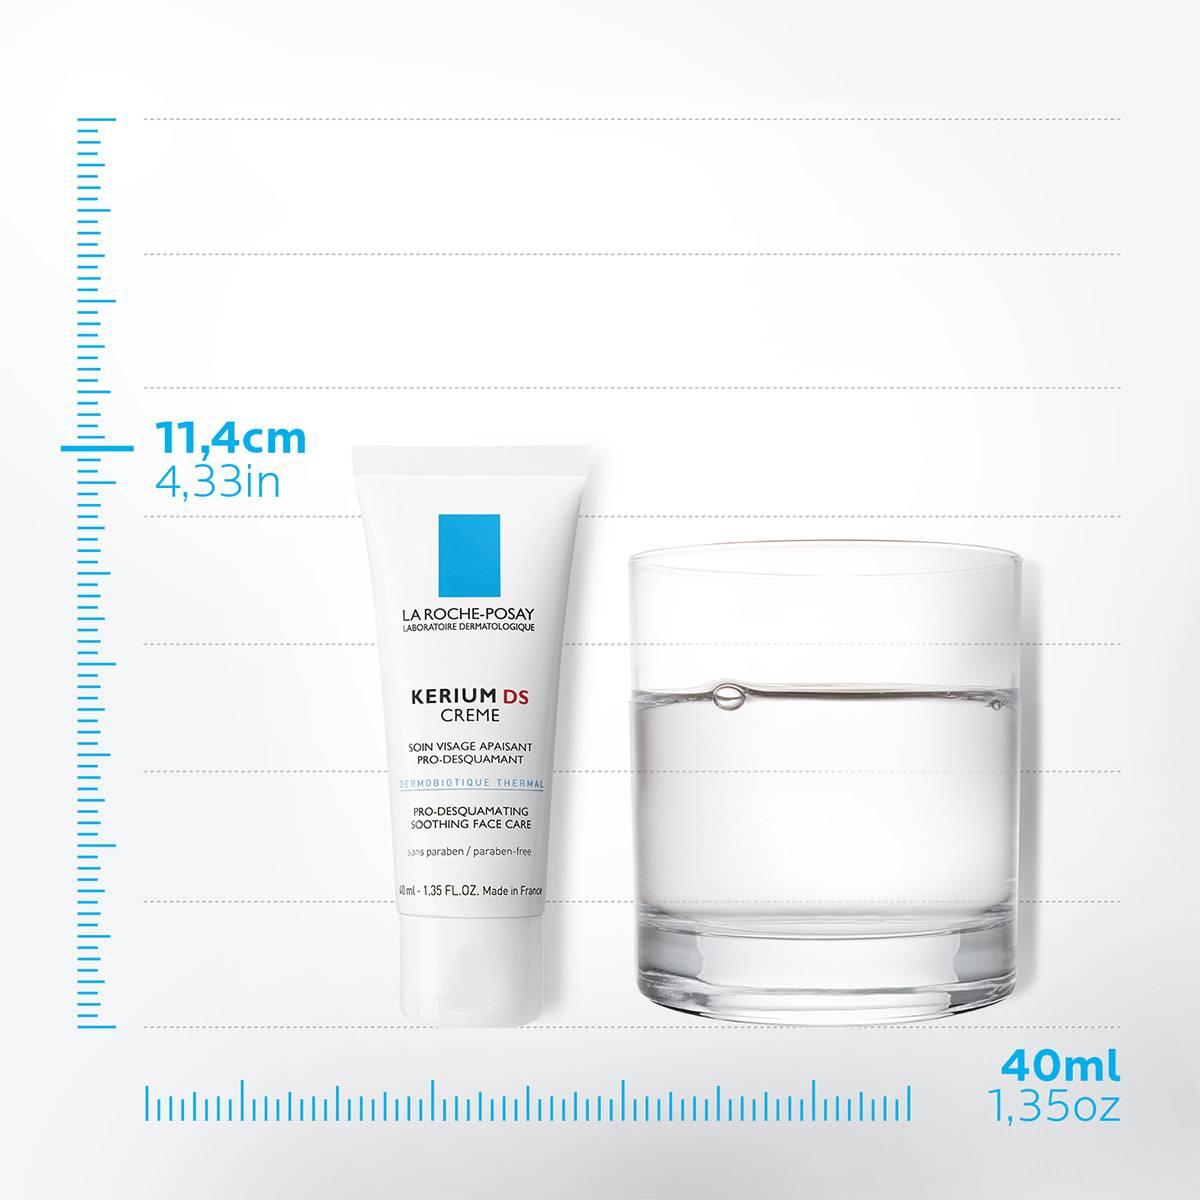 La Roche Posay ProduktSide Kerium DS Ansigtscreme 40ml 3337872411793